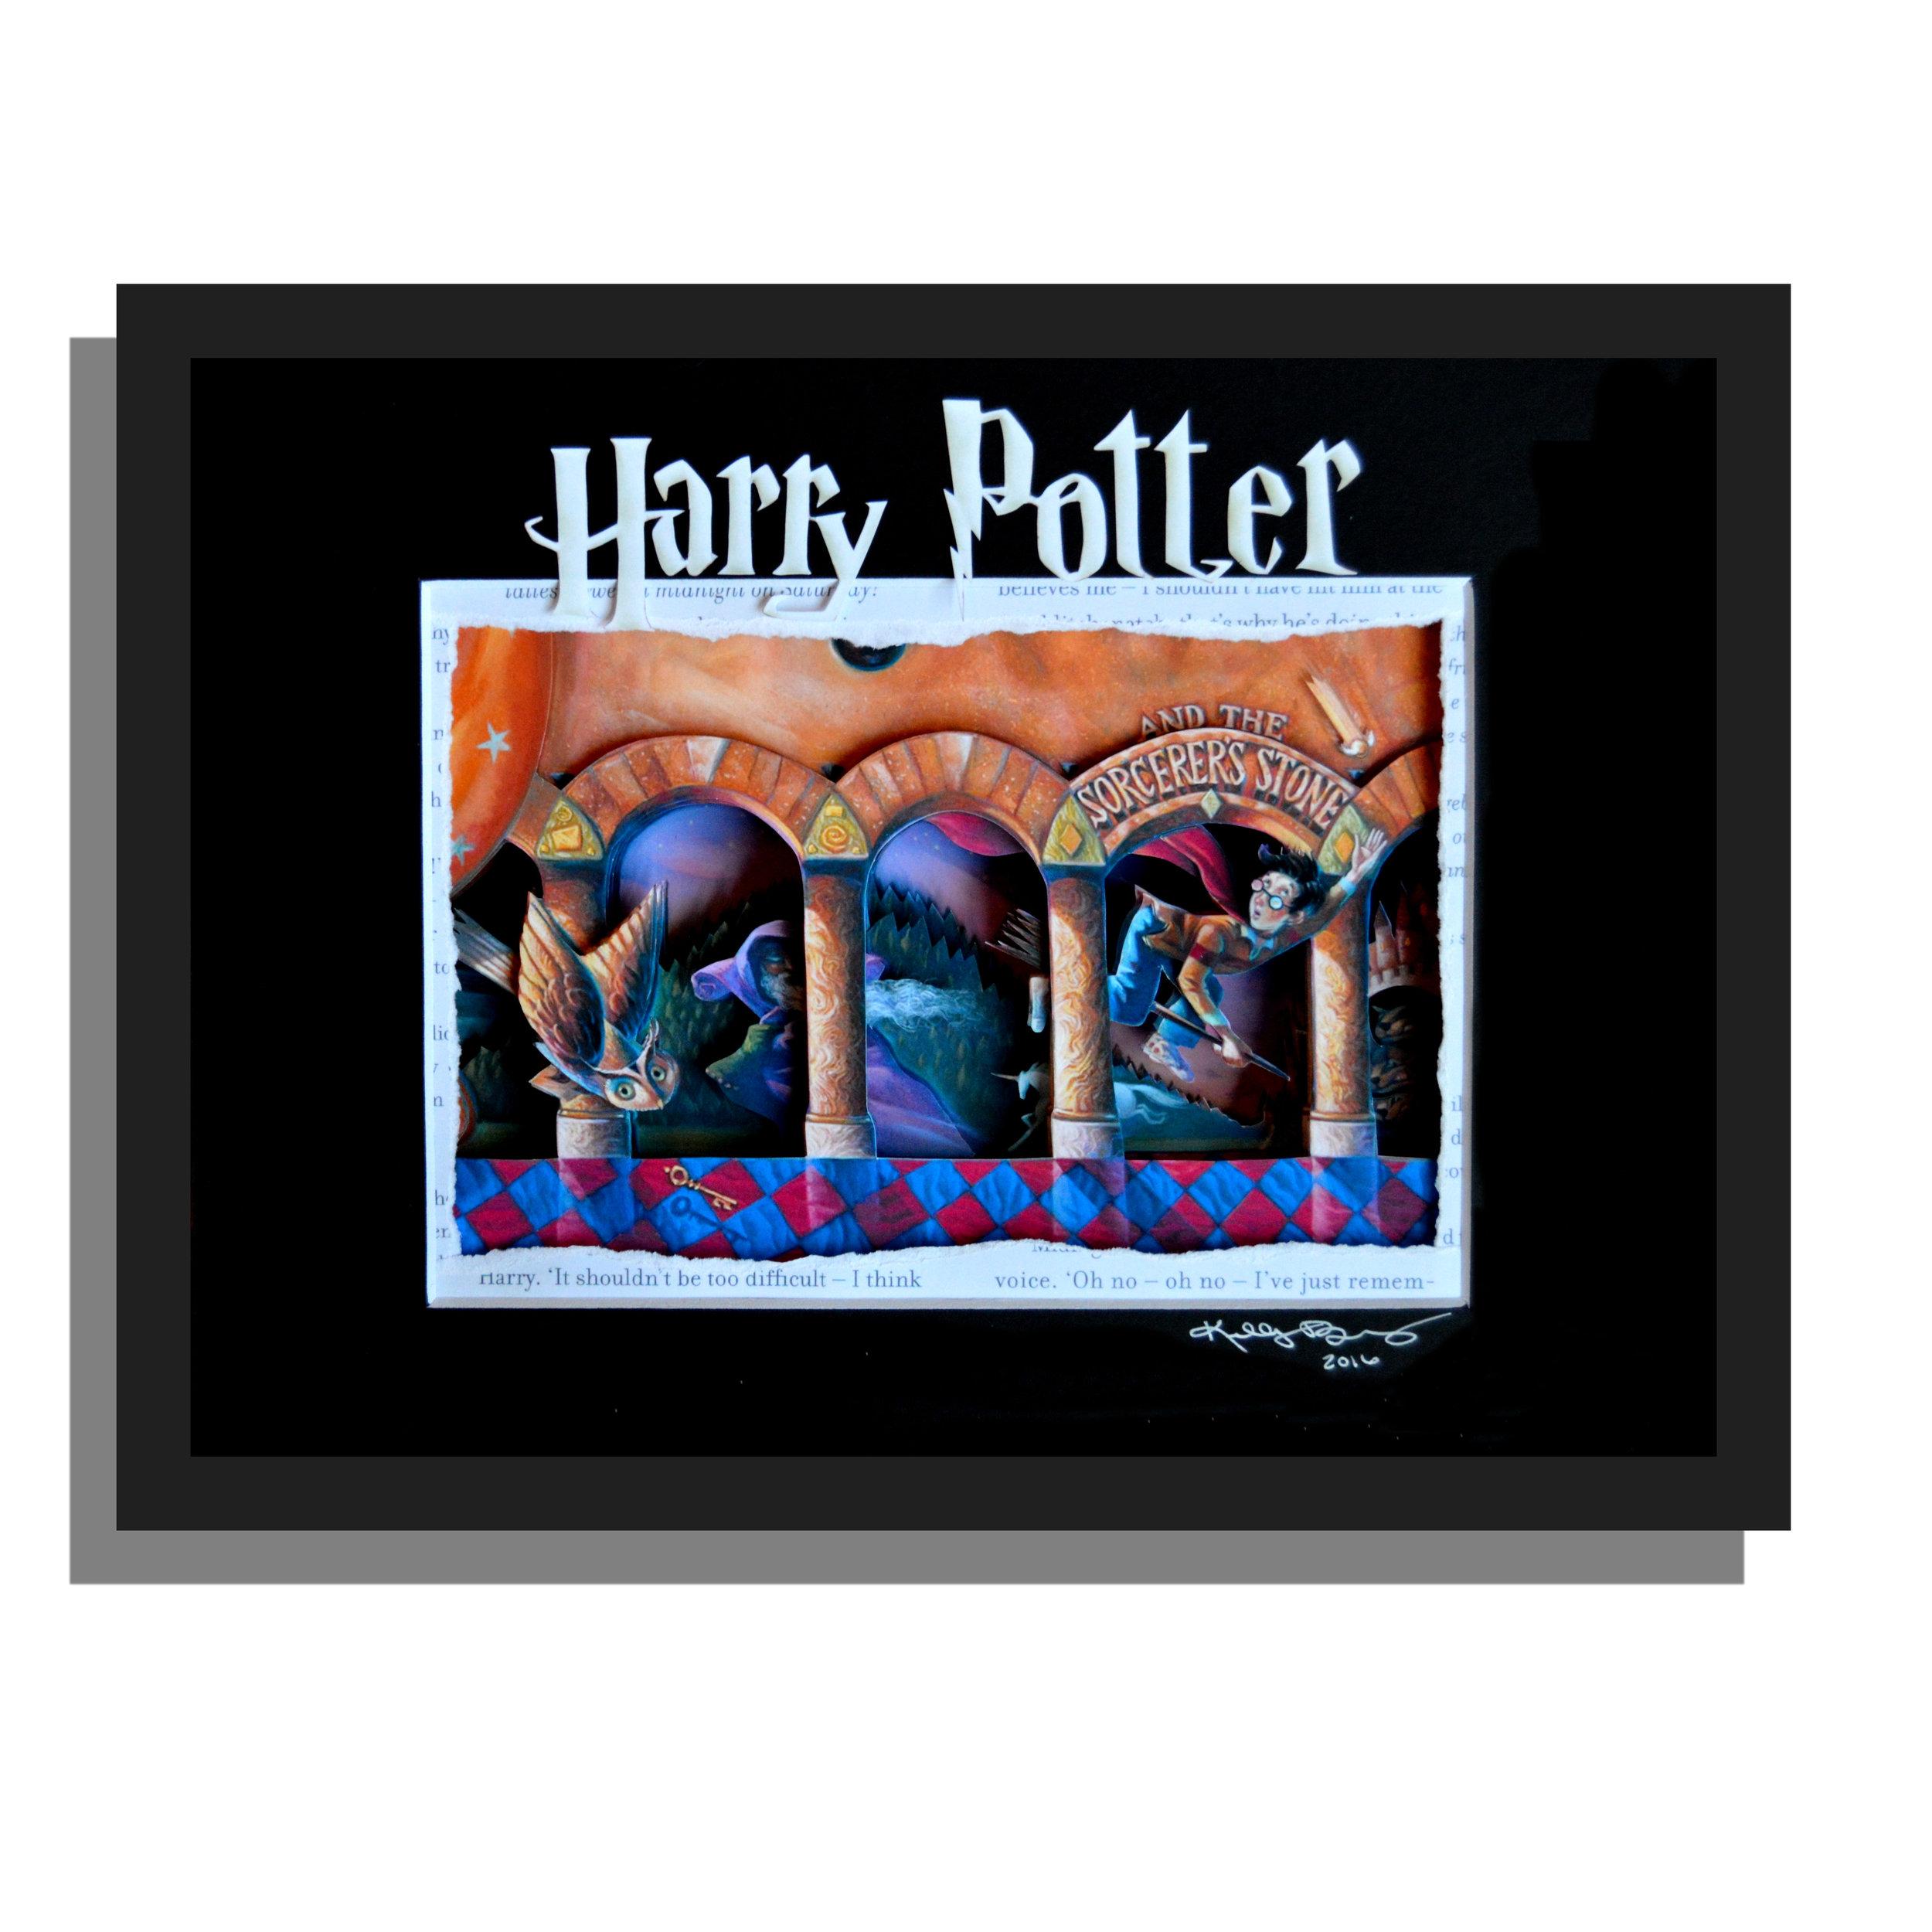 HarrypotterCoverB2.jpg